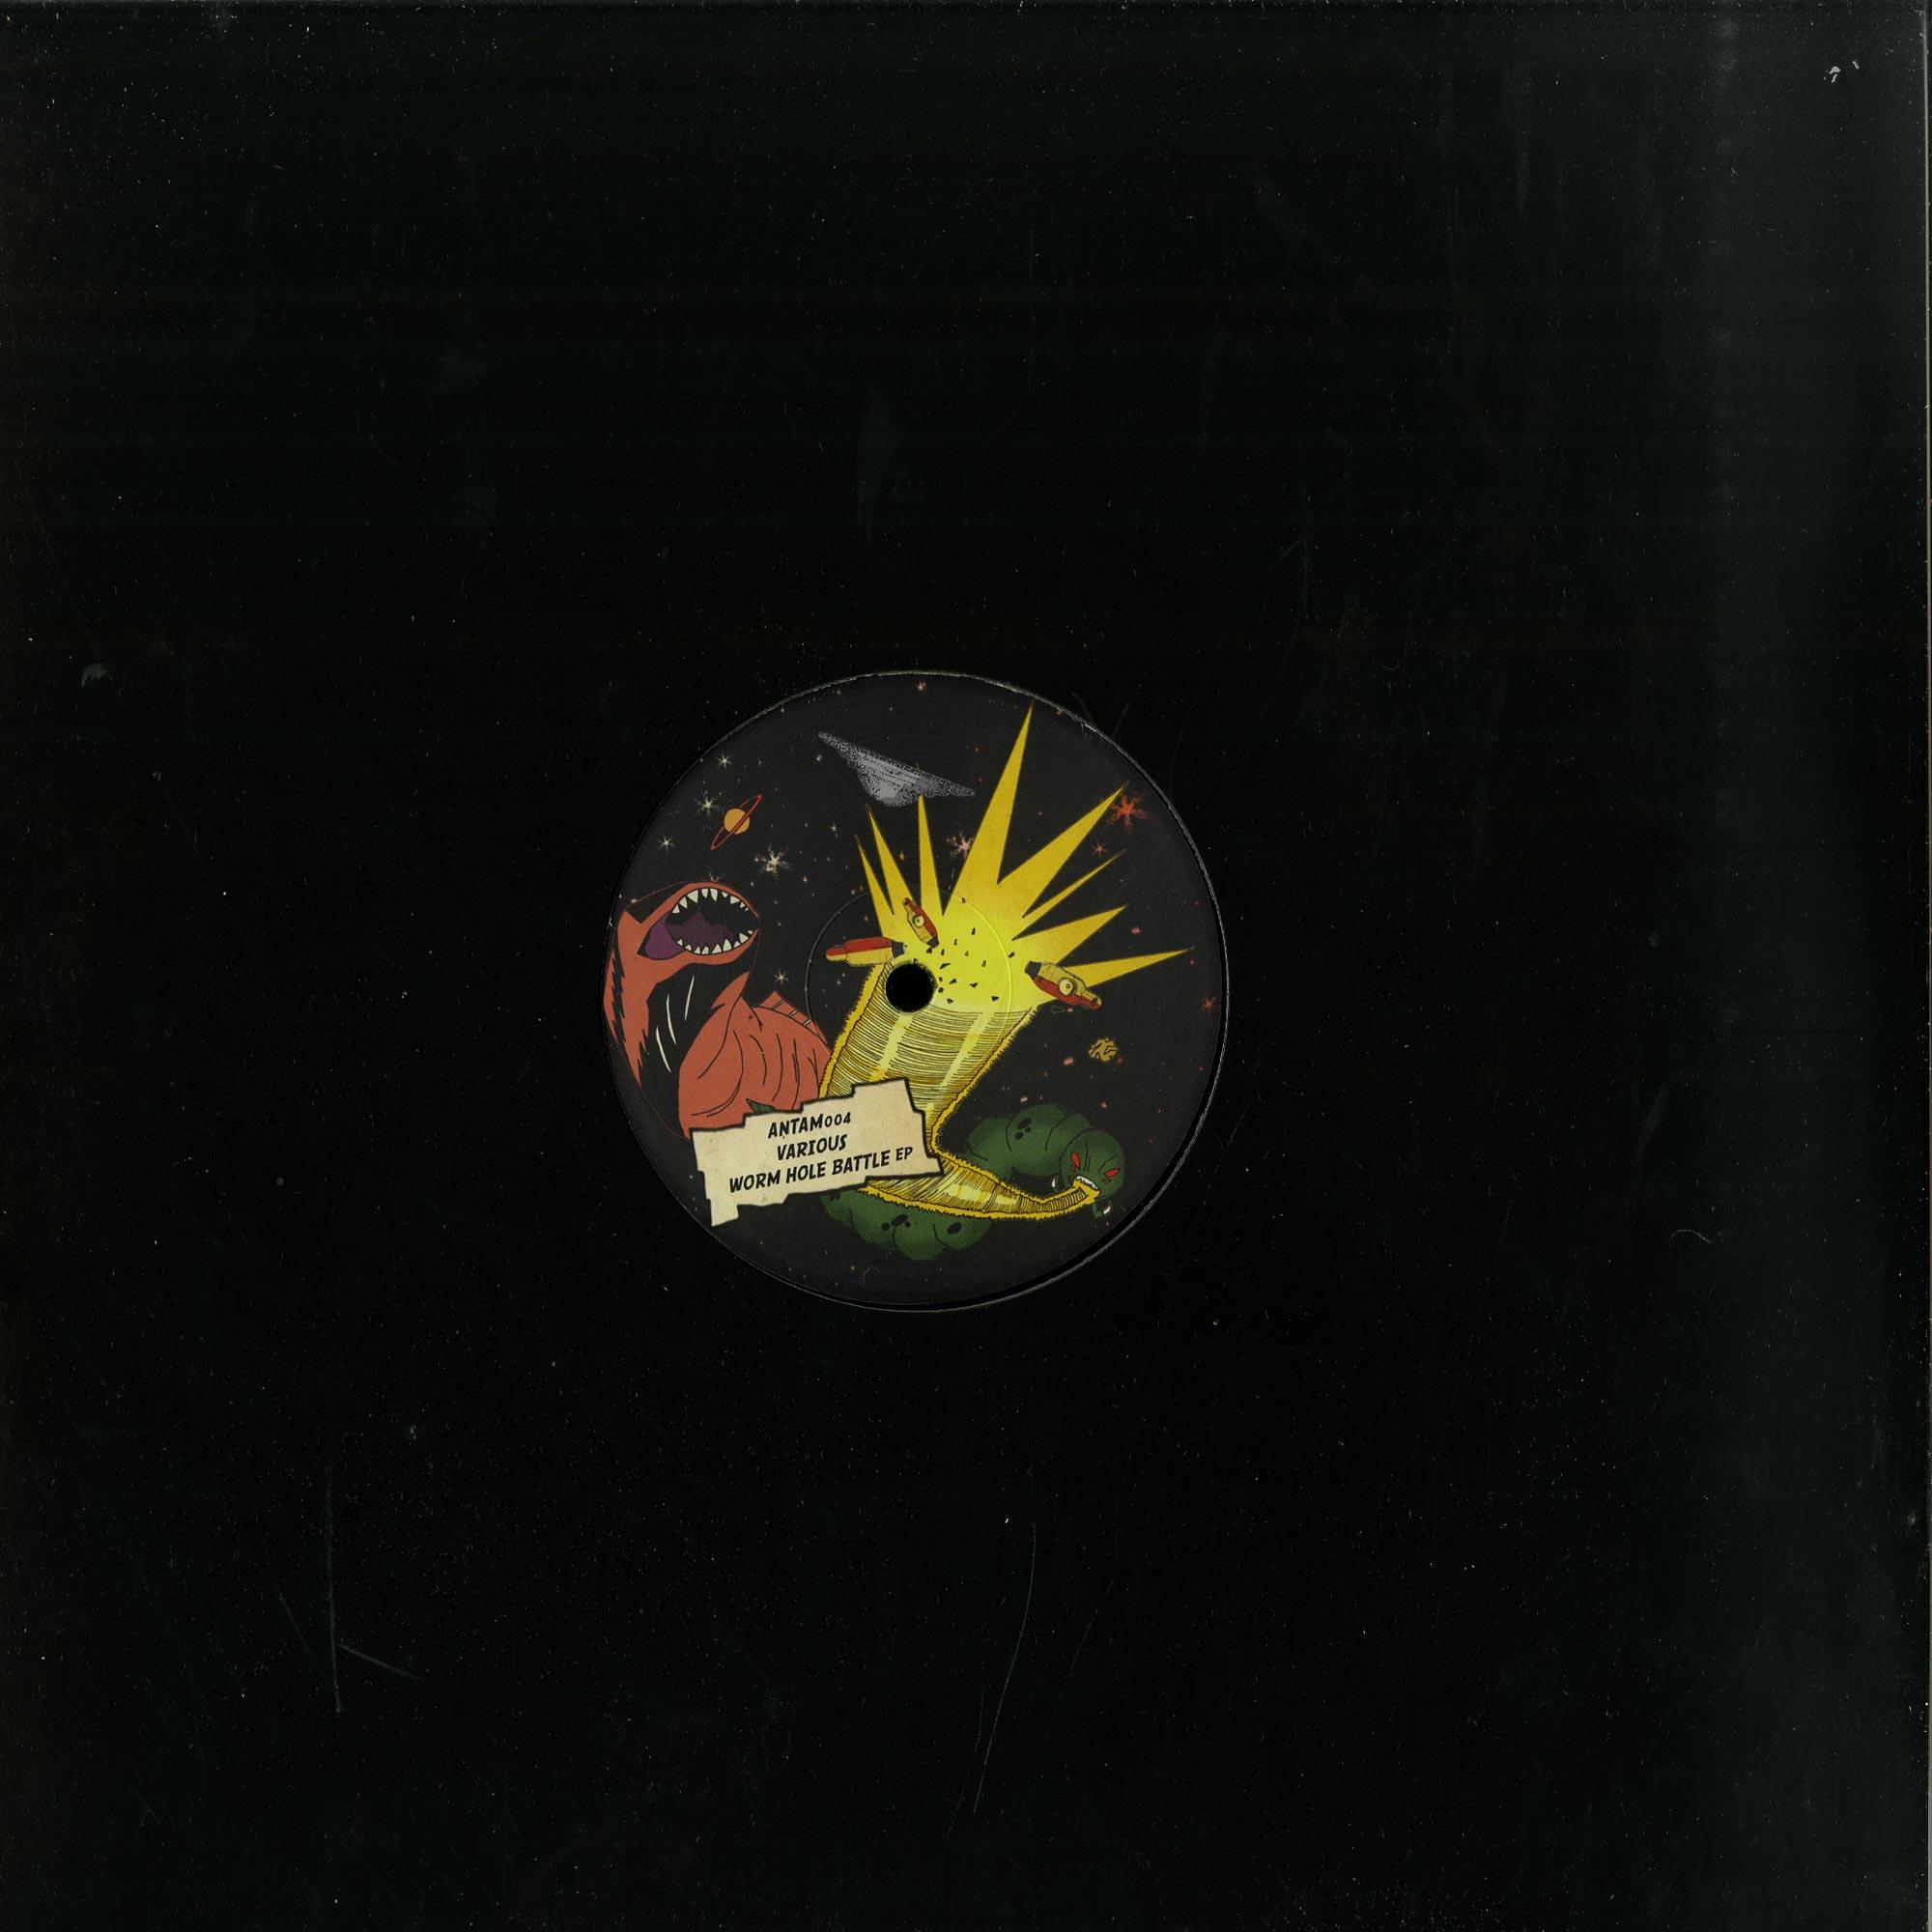 Various Artists - WORM HOLE BATTLE EP